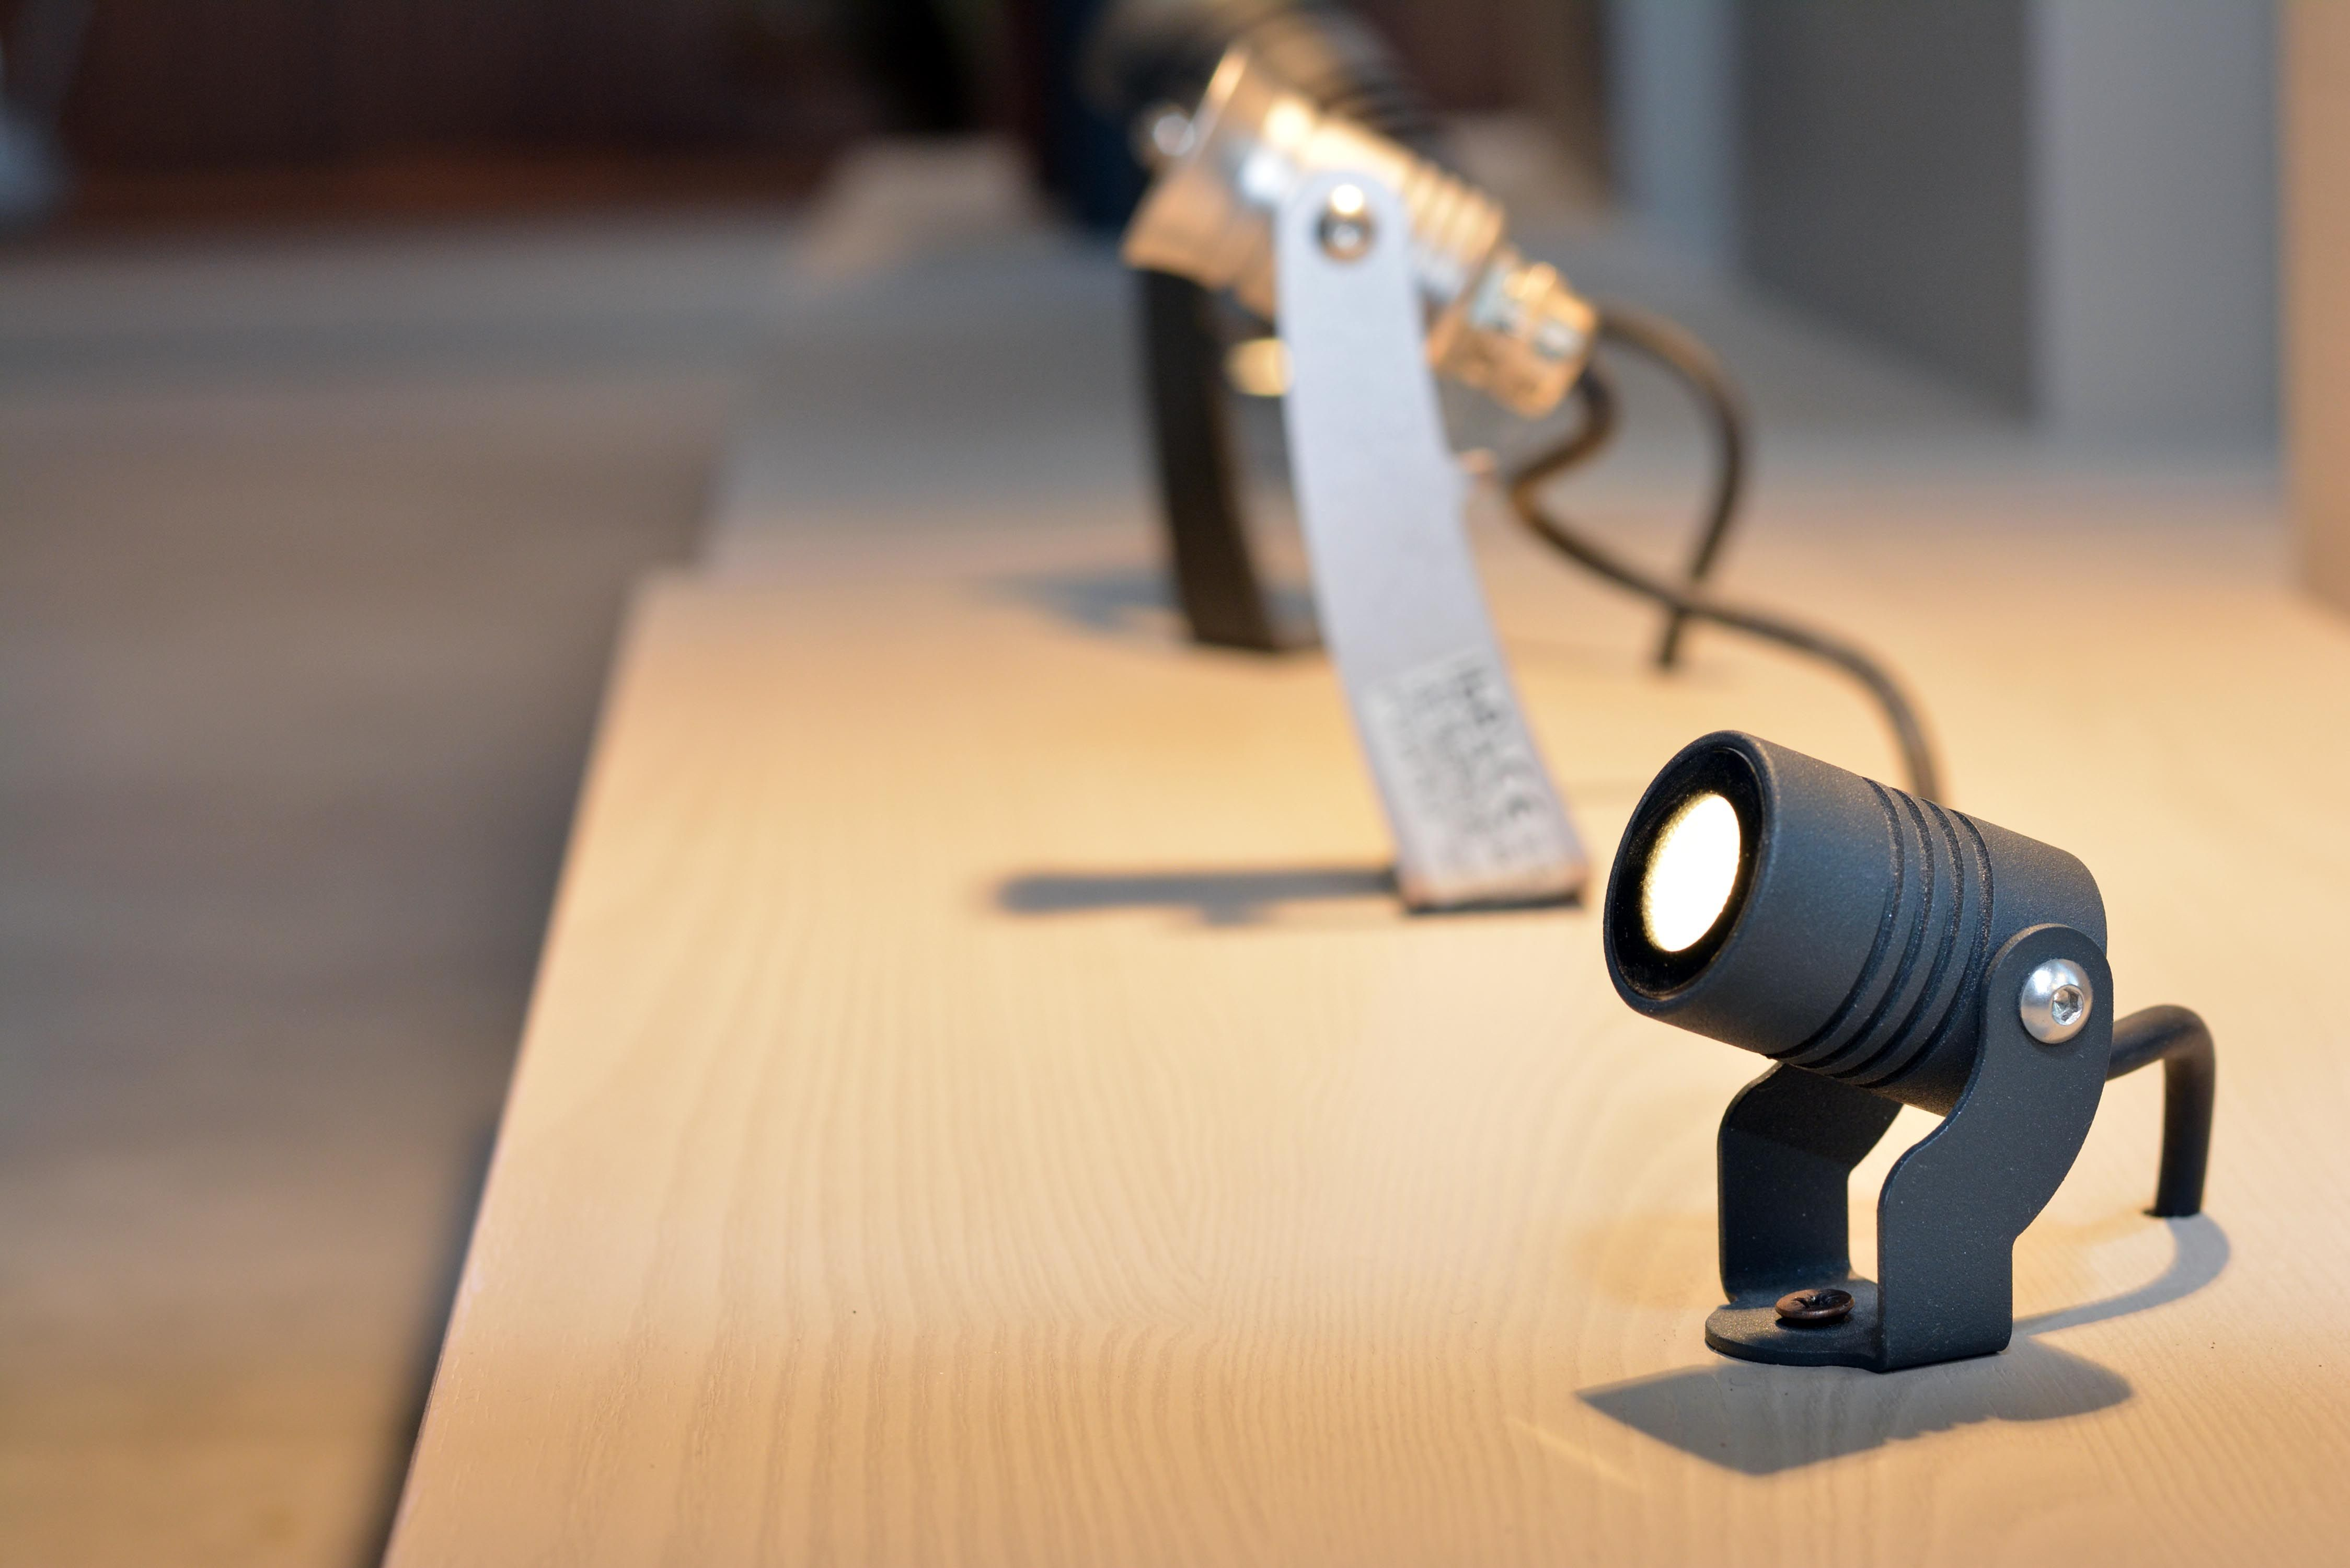 متجر الإضاءة في دبي شراء اضاءة اون لاين Elettrico In Dubai Living Room Design Decor Modern Ceiling Light Lighting Design Interior